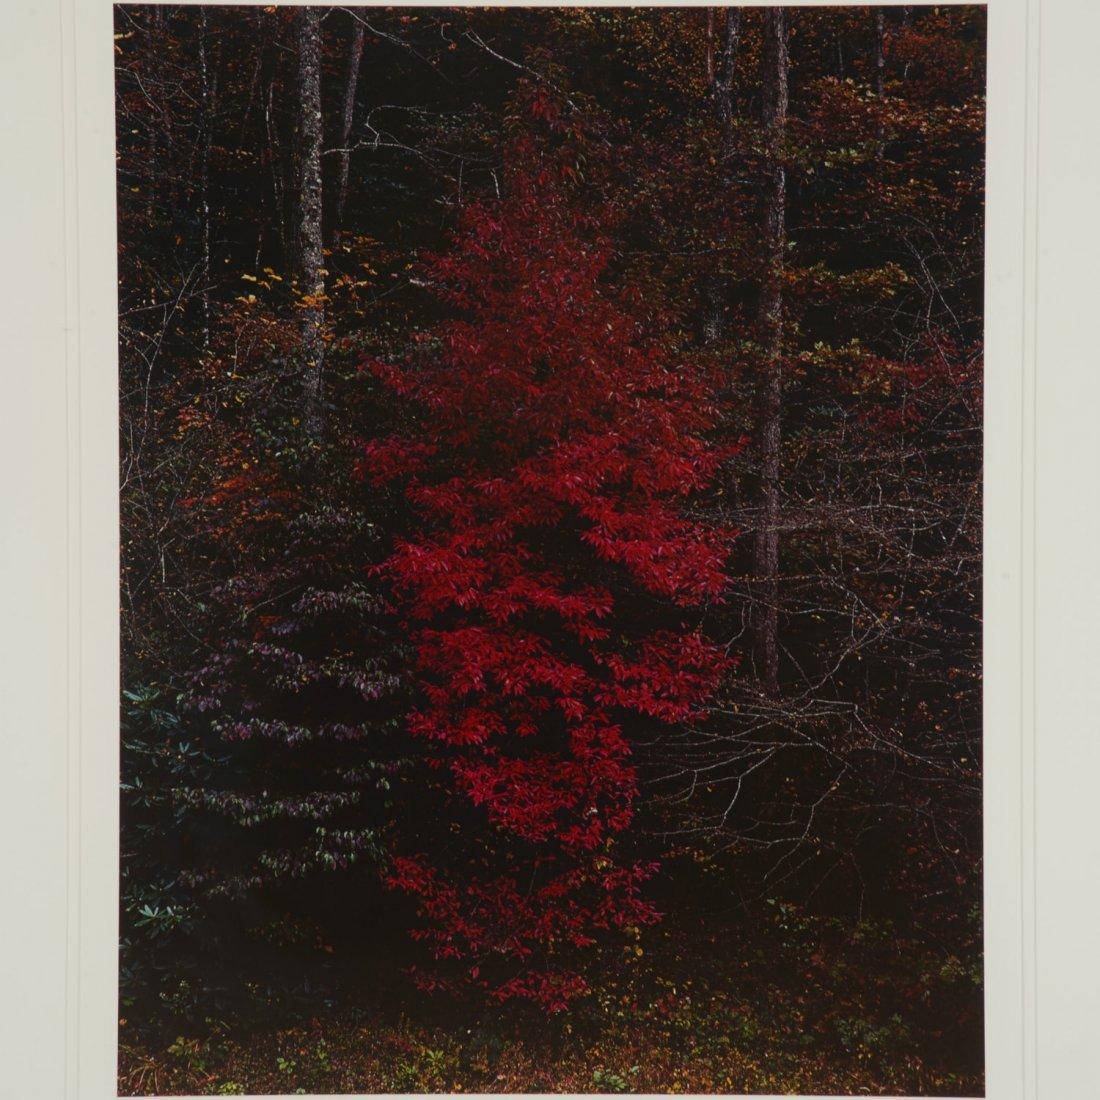 Eliot Porter, photograph - 2